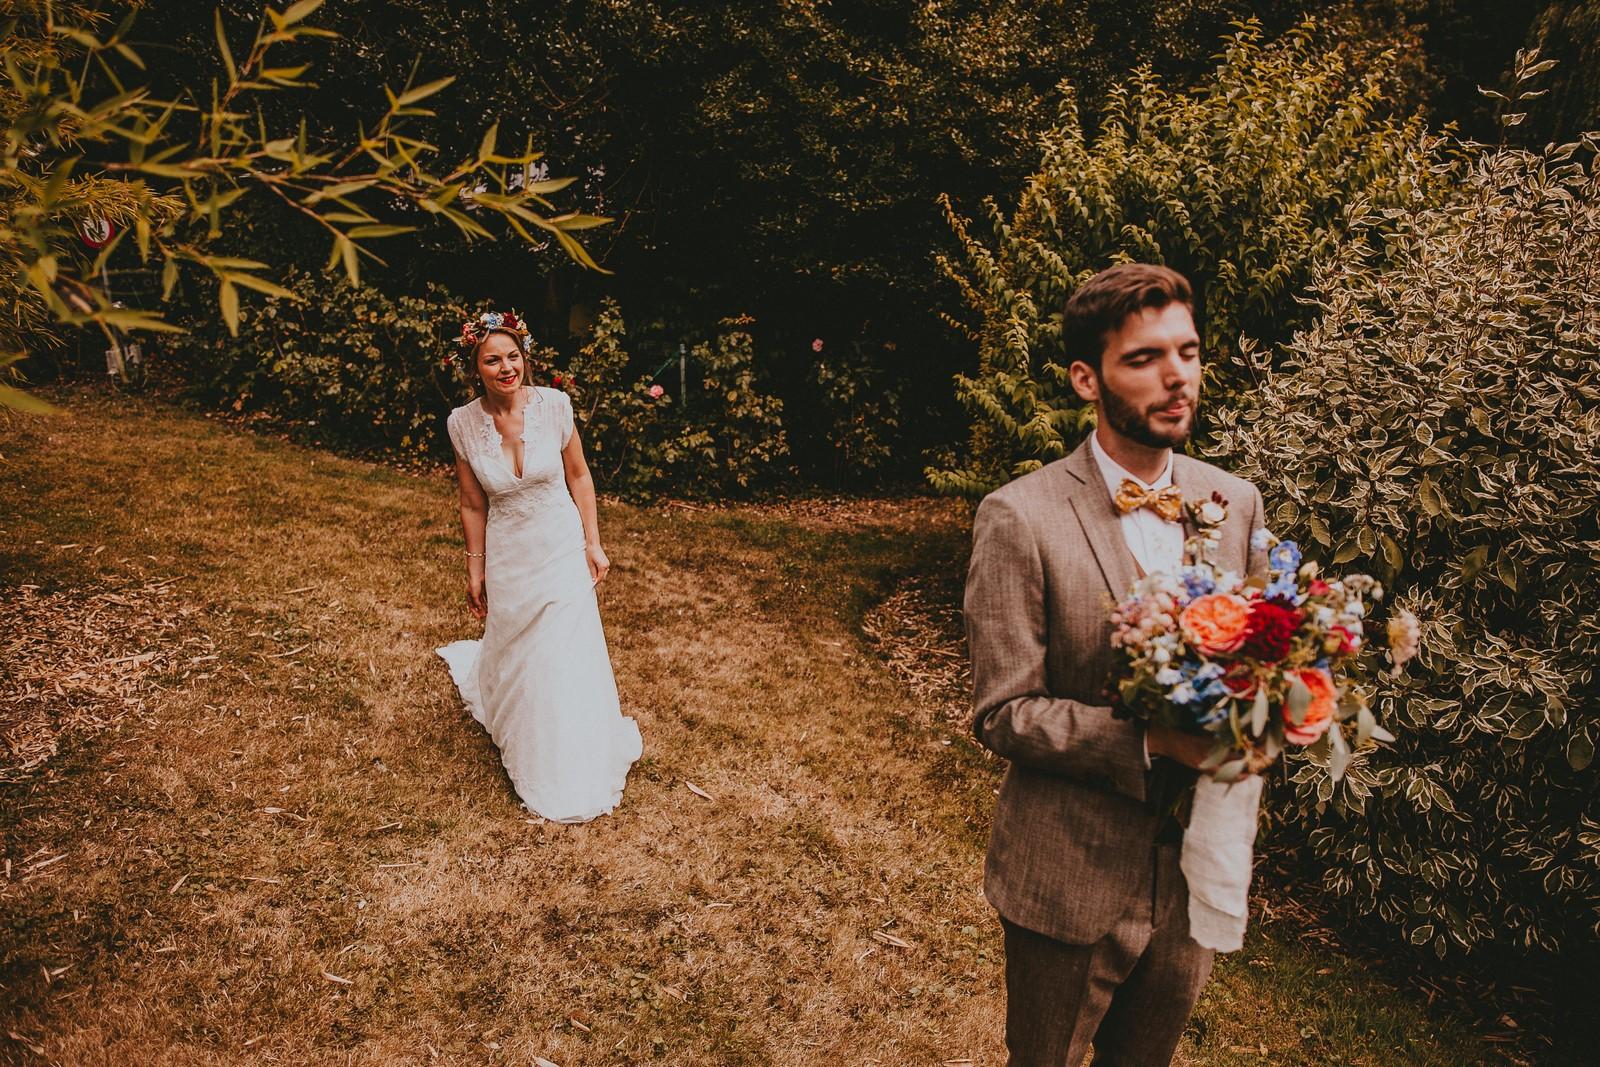 photographe mariage chateau de bourgogne 27